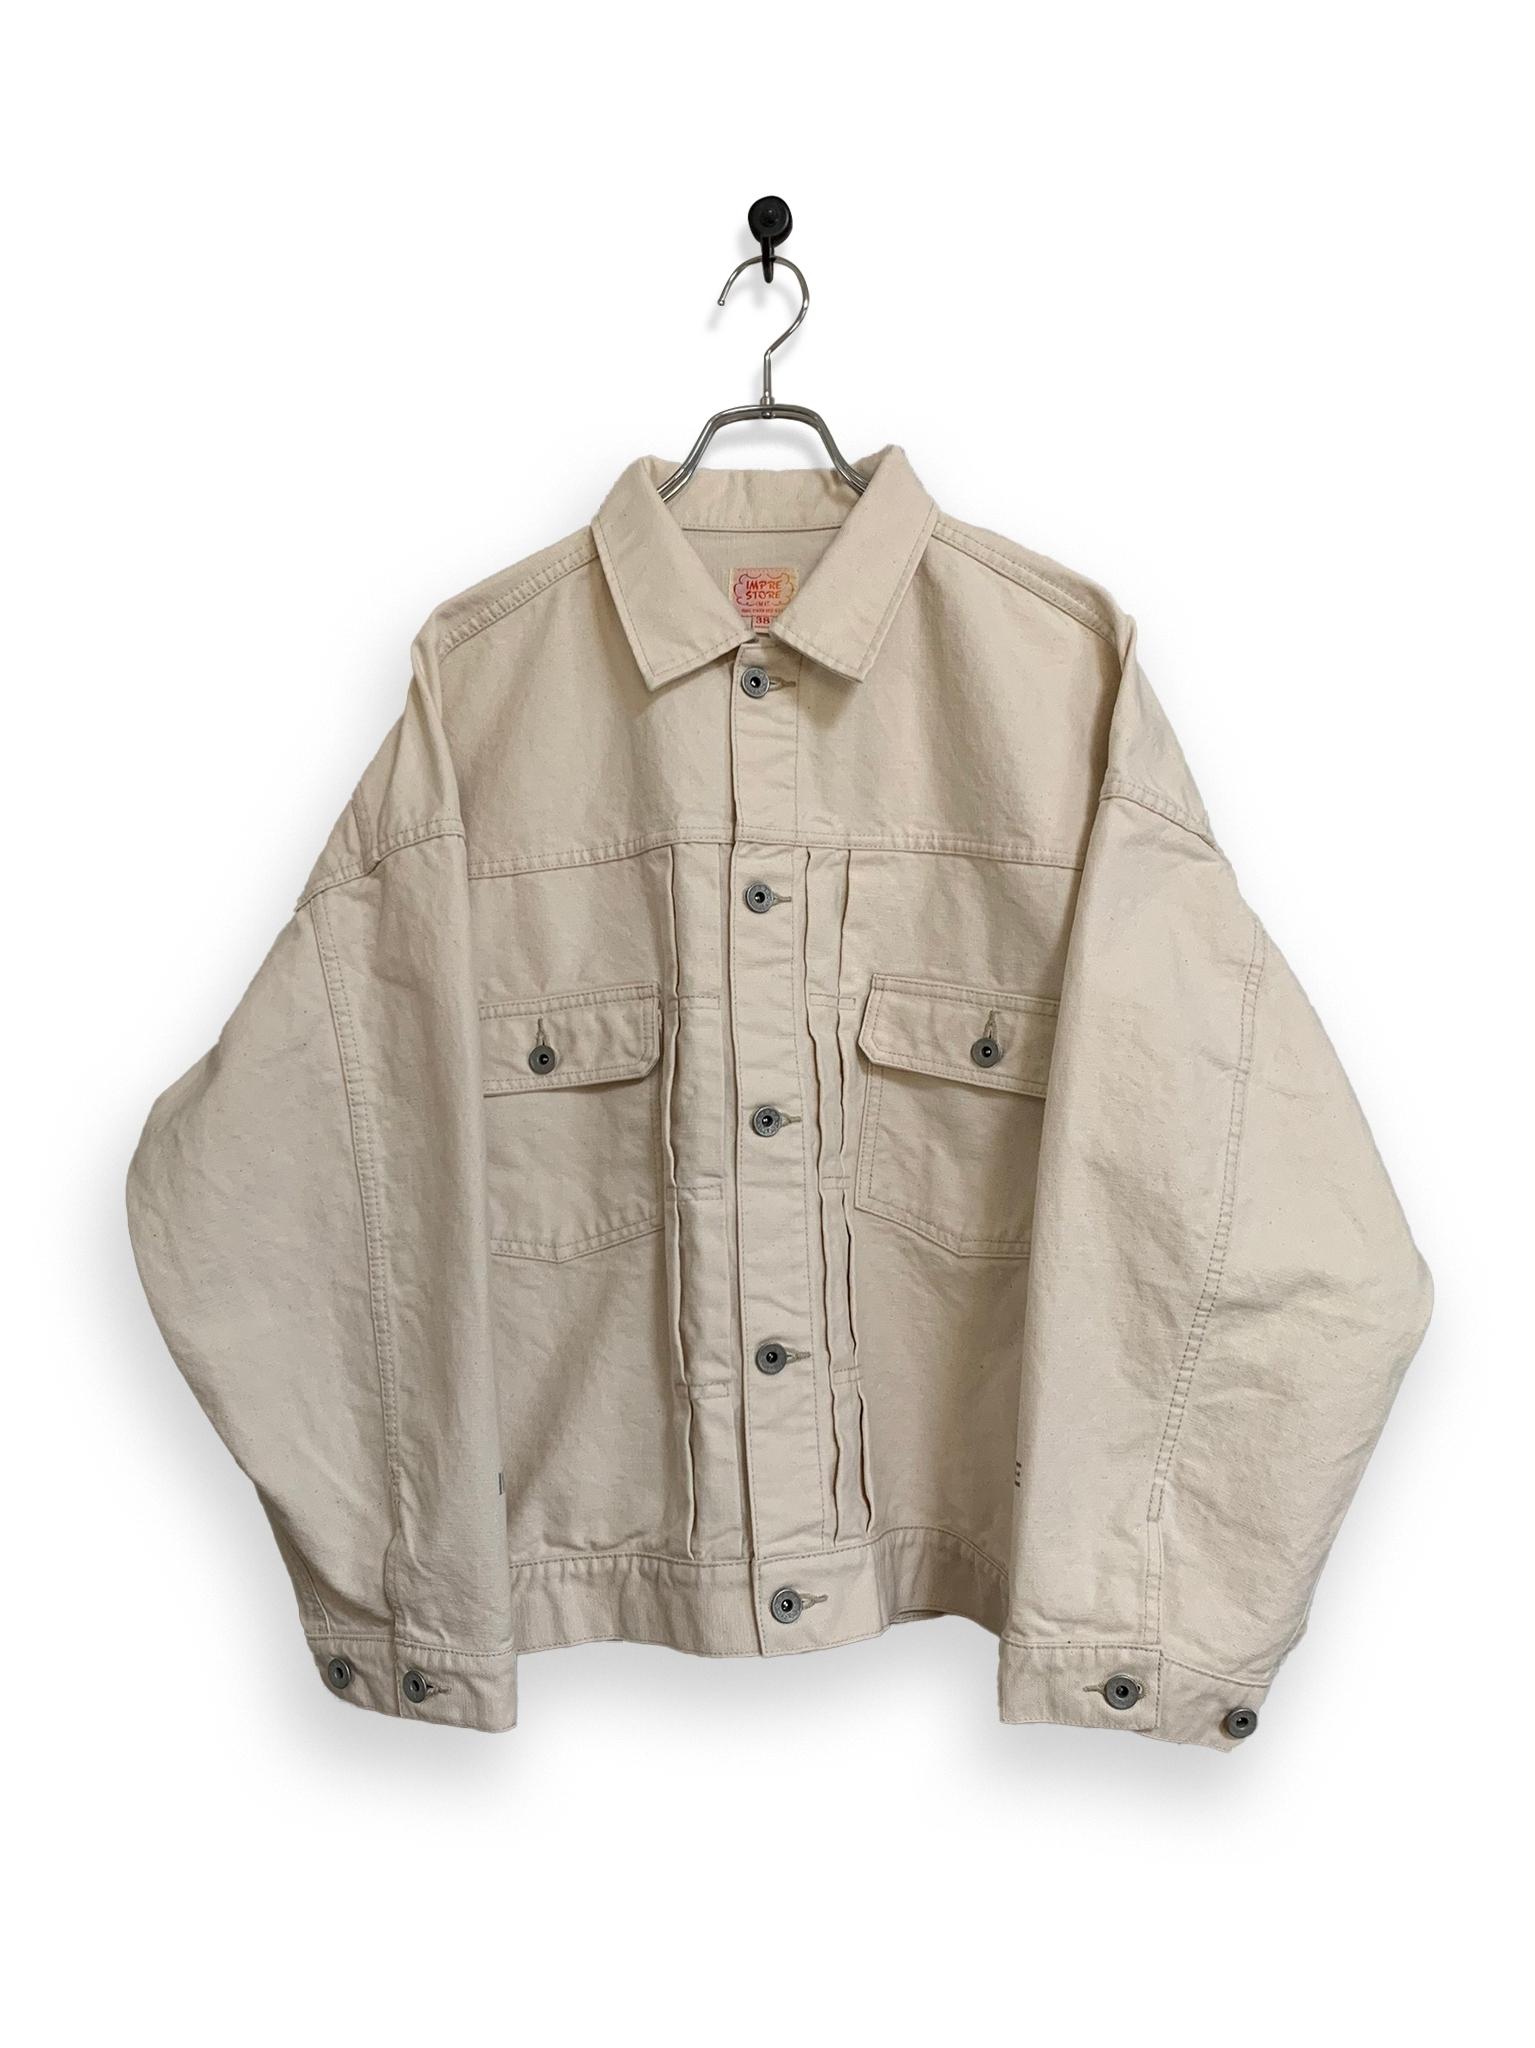 13.5oz Canvas Jacket / one wash / natural